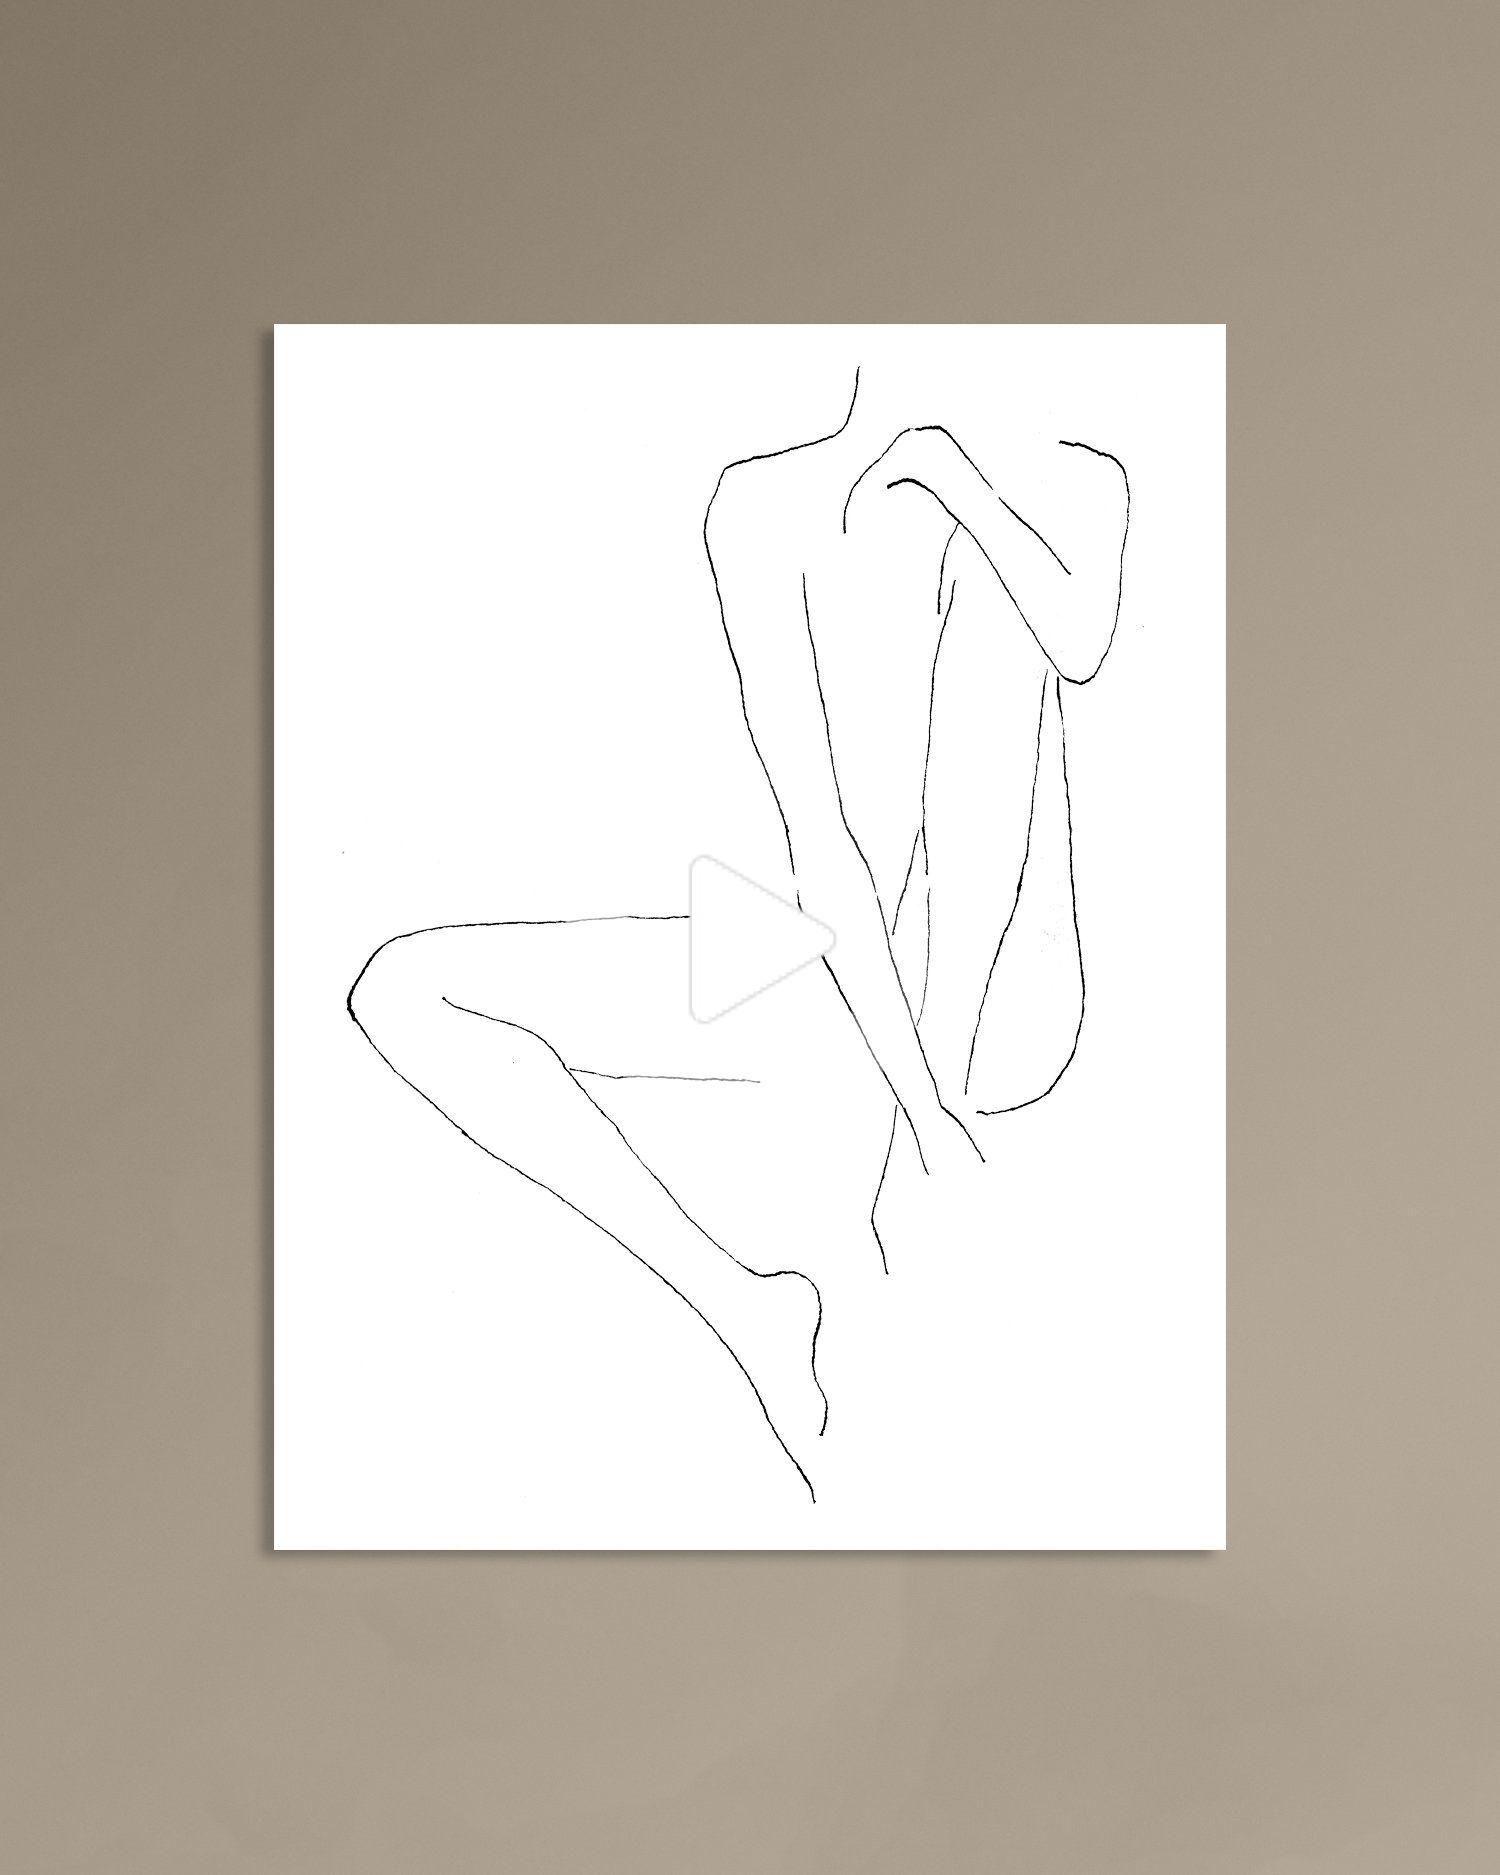 Minimalist Woman Printable Illustration Abstract Color Block Art Natural Warm Color Art Modern In 2020 Line Art Drawings Minimalist Women Modern Art Prints